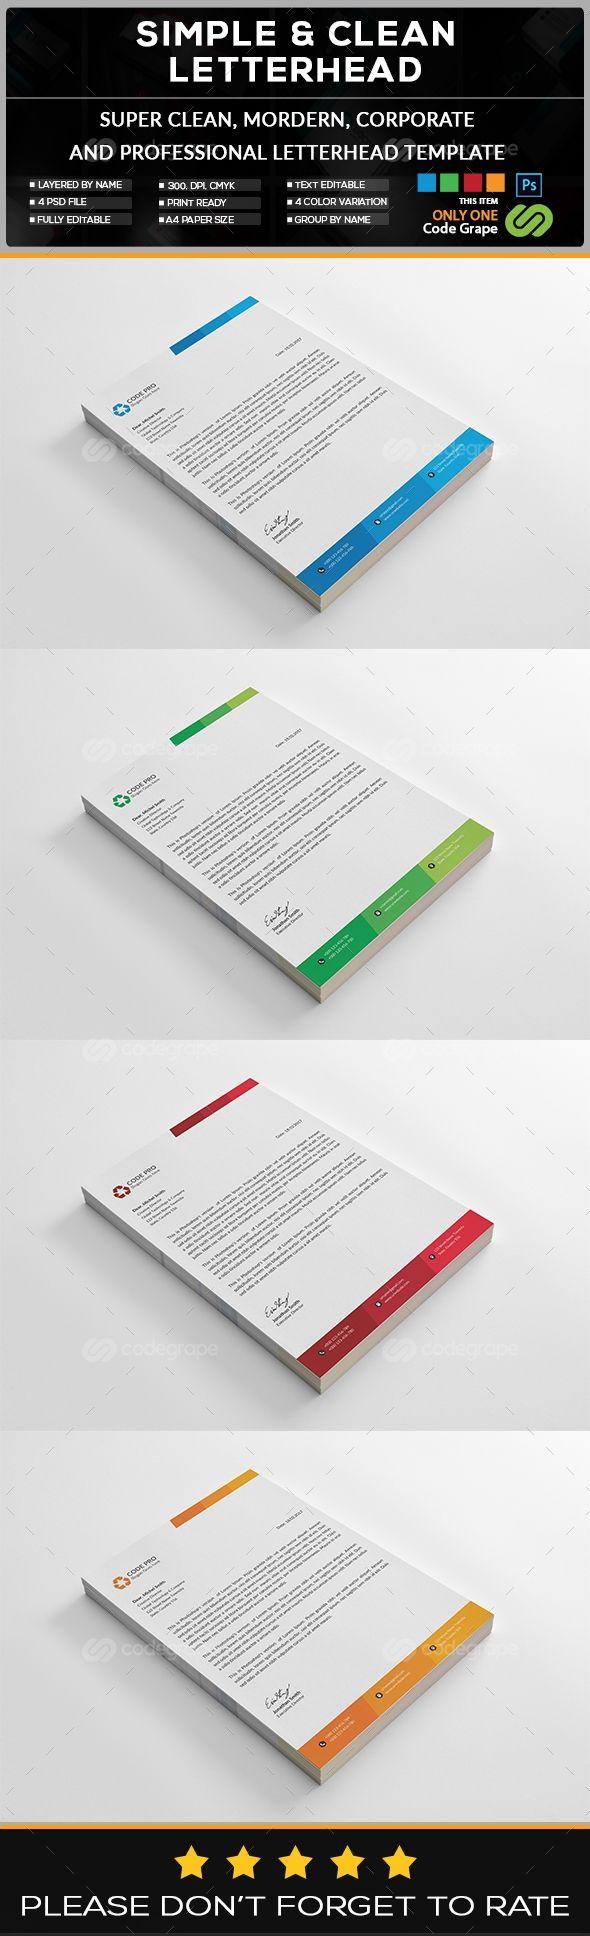 corporate letterhead on codegrape more info httpswwwcodegrape letterhead designbrochure ideasstationary - Letterhead Design Ideas